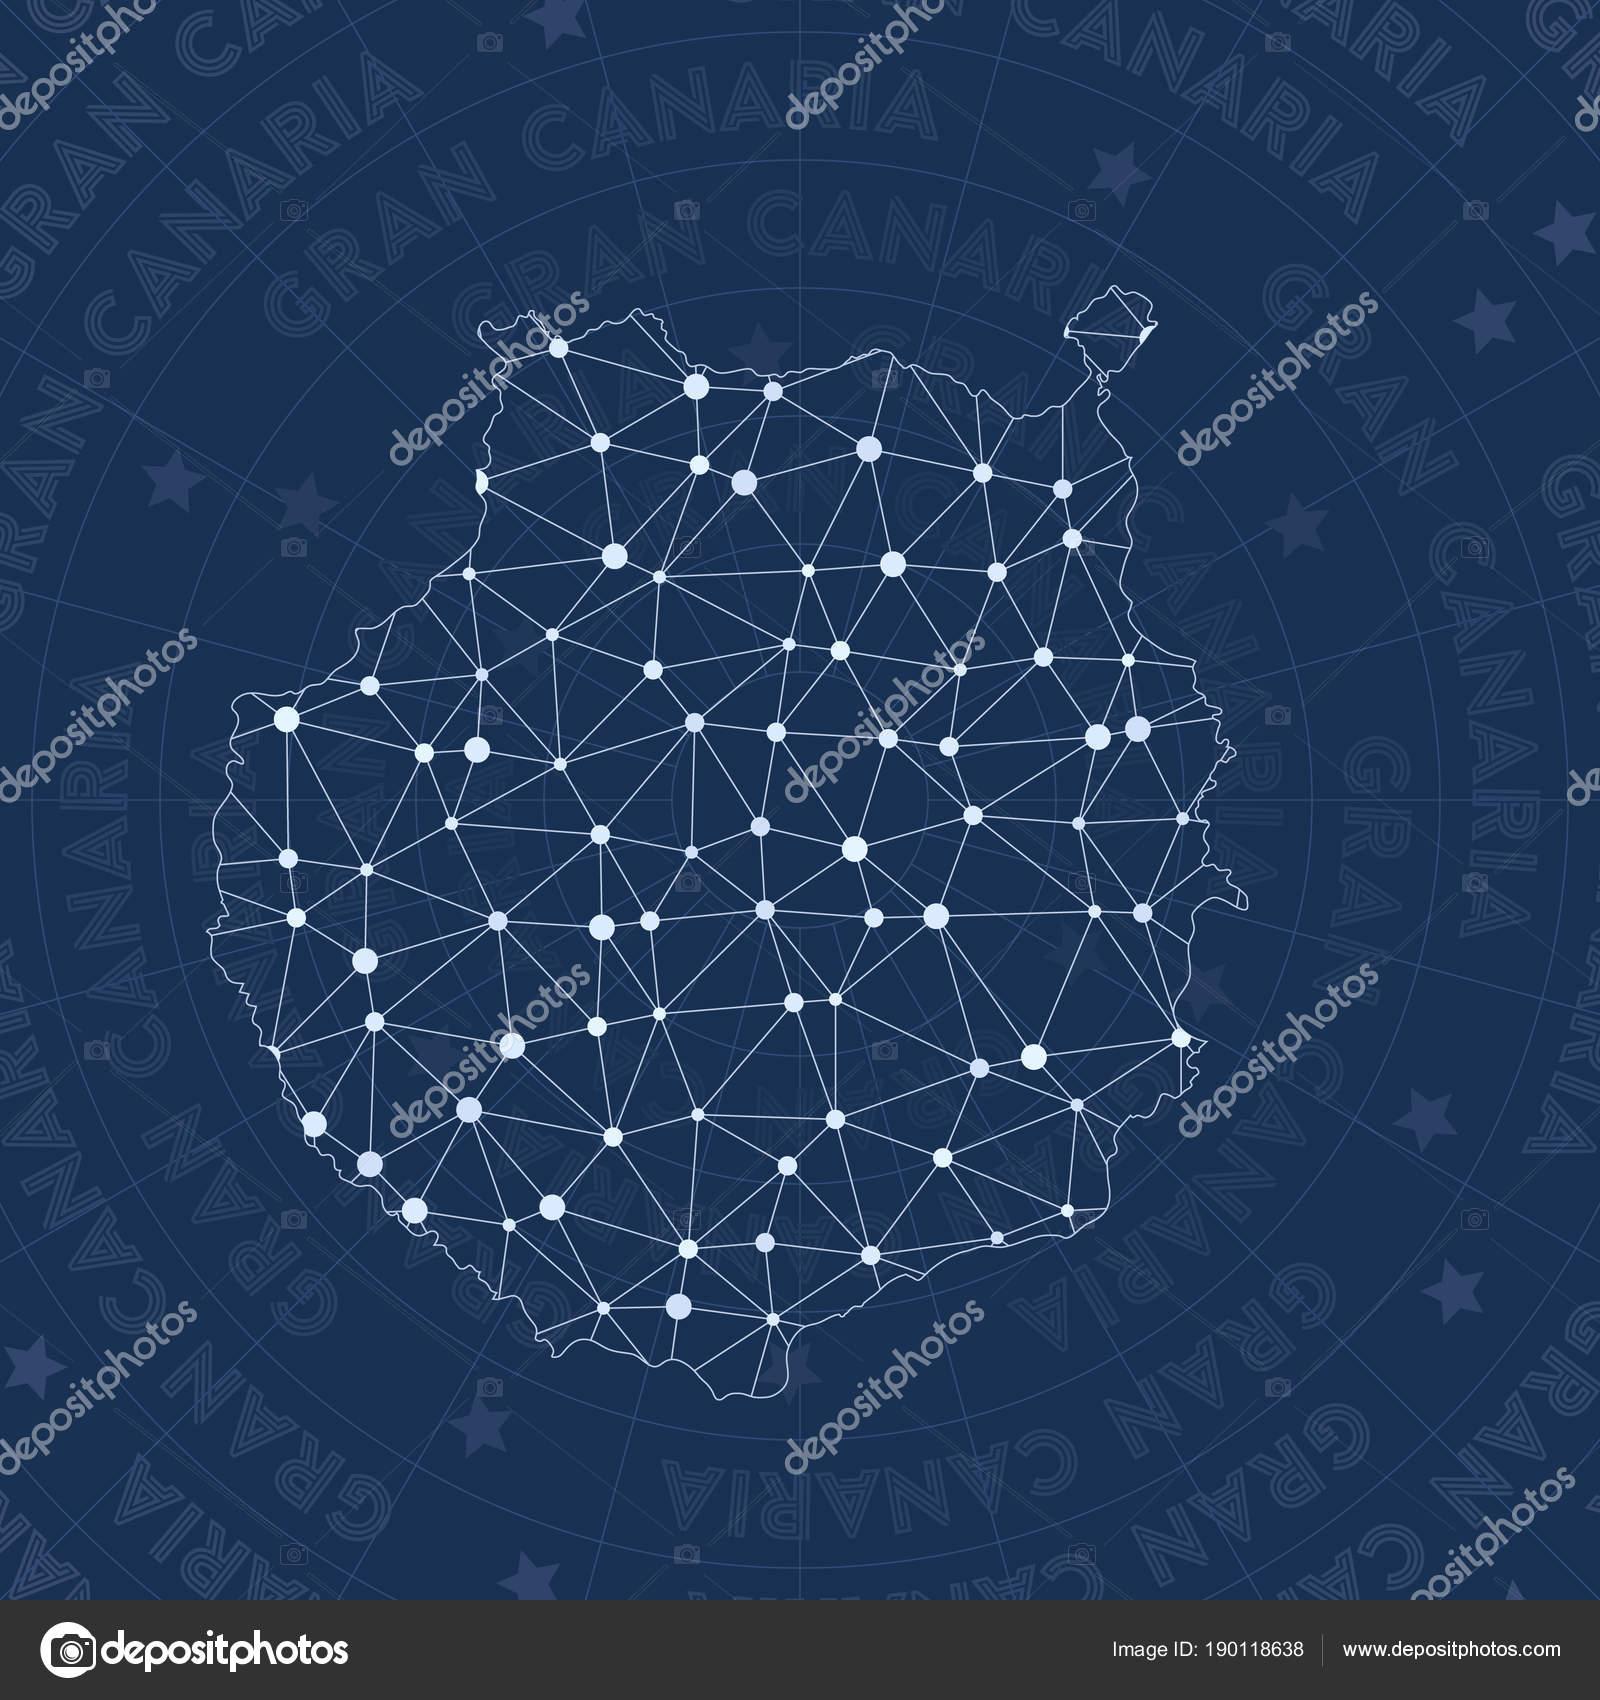 Gran Canaria Netzwerk Stil Insel Sternbildkarte populären Stil ...